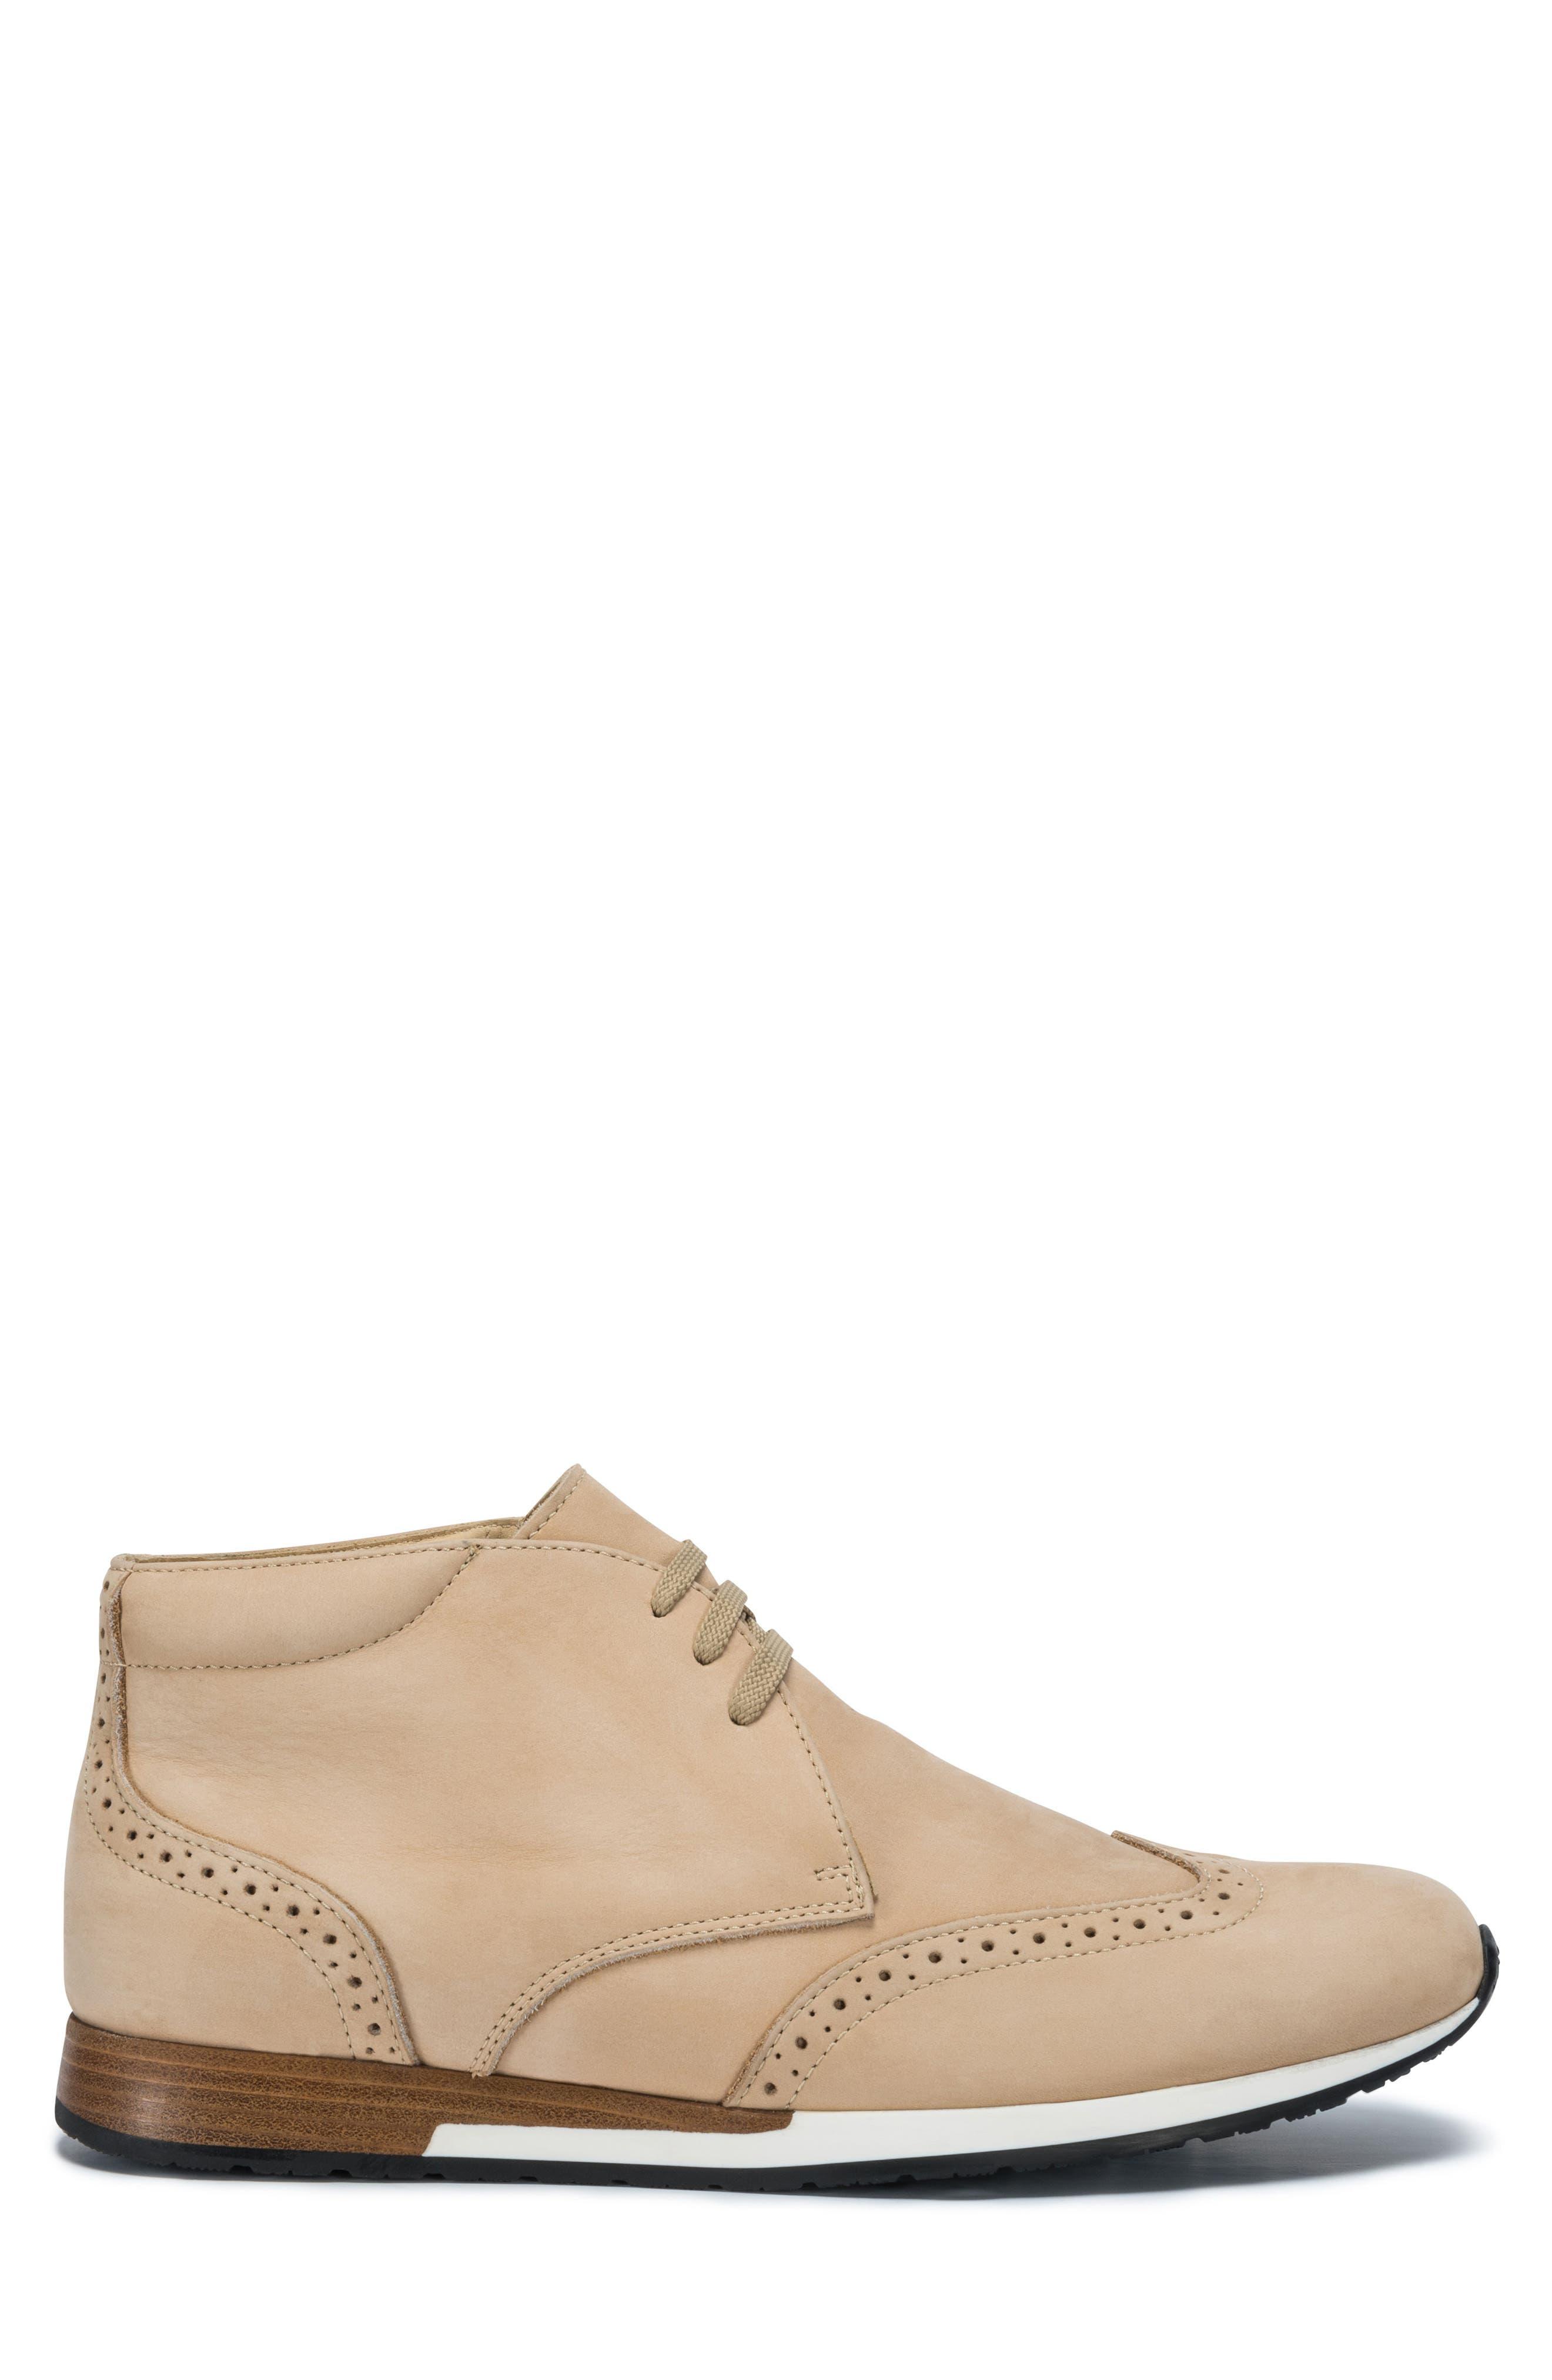 Pistoia Chukka Sneaker,                             Alternate thumbnail 3, color,                             278